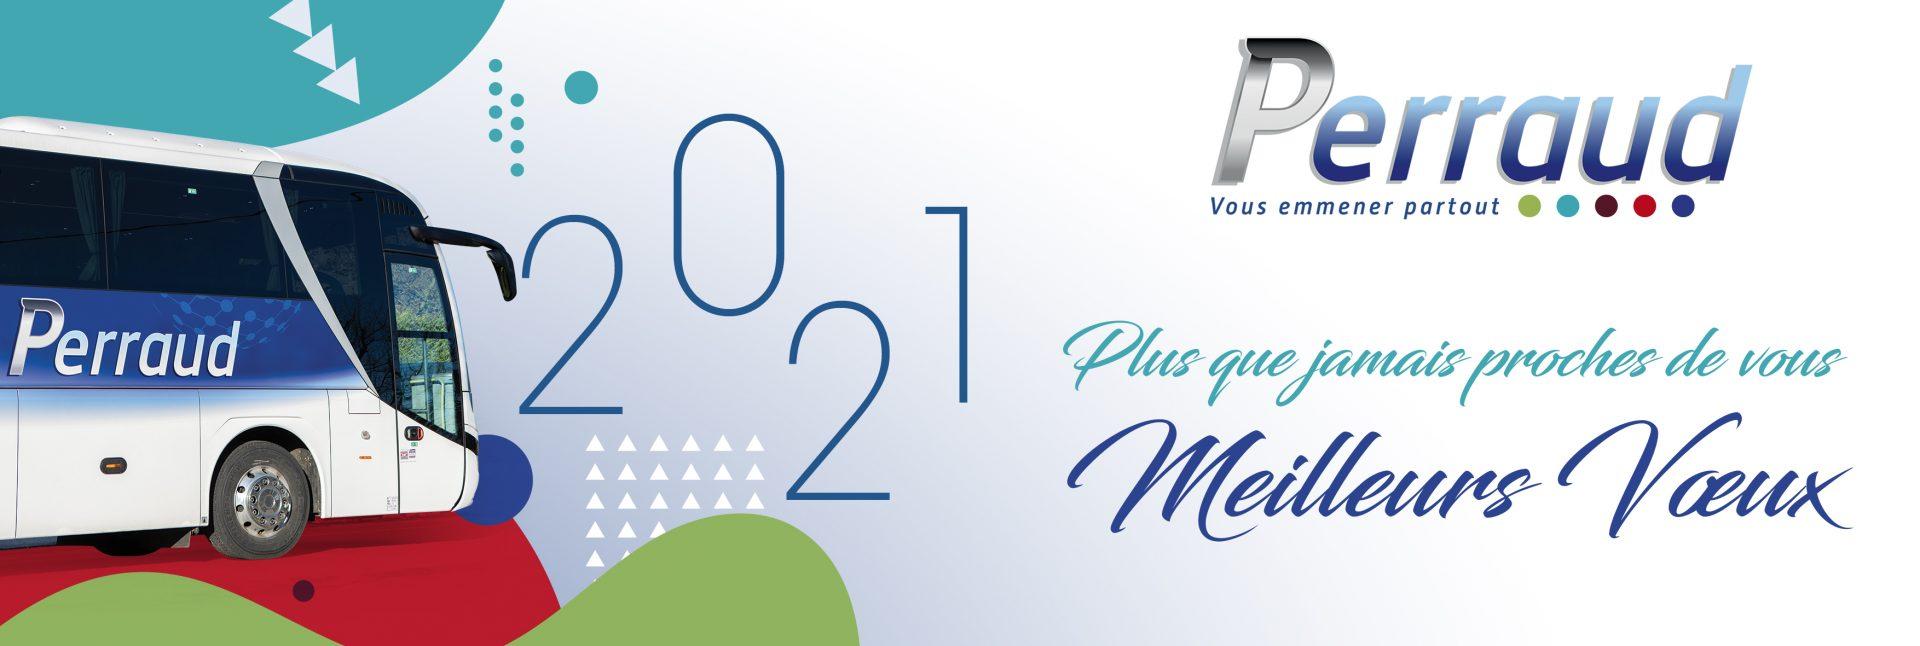 Voeux_perraud_2021